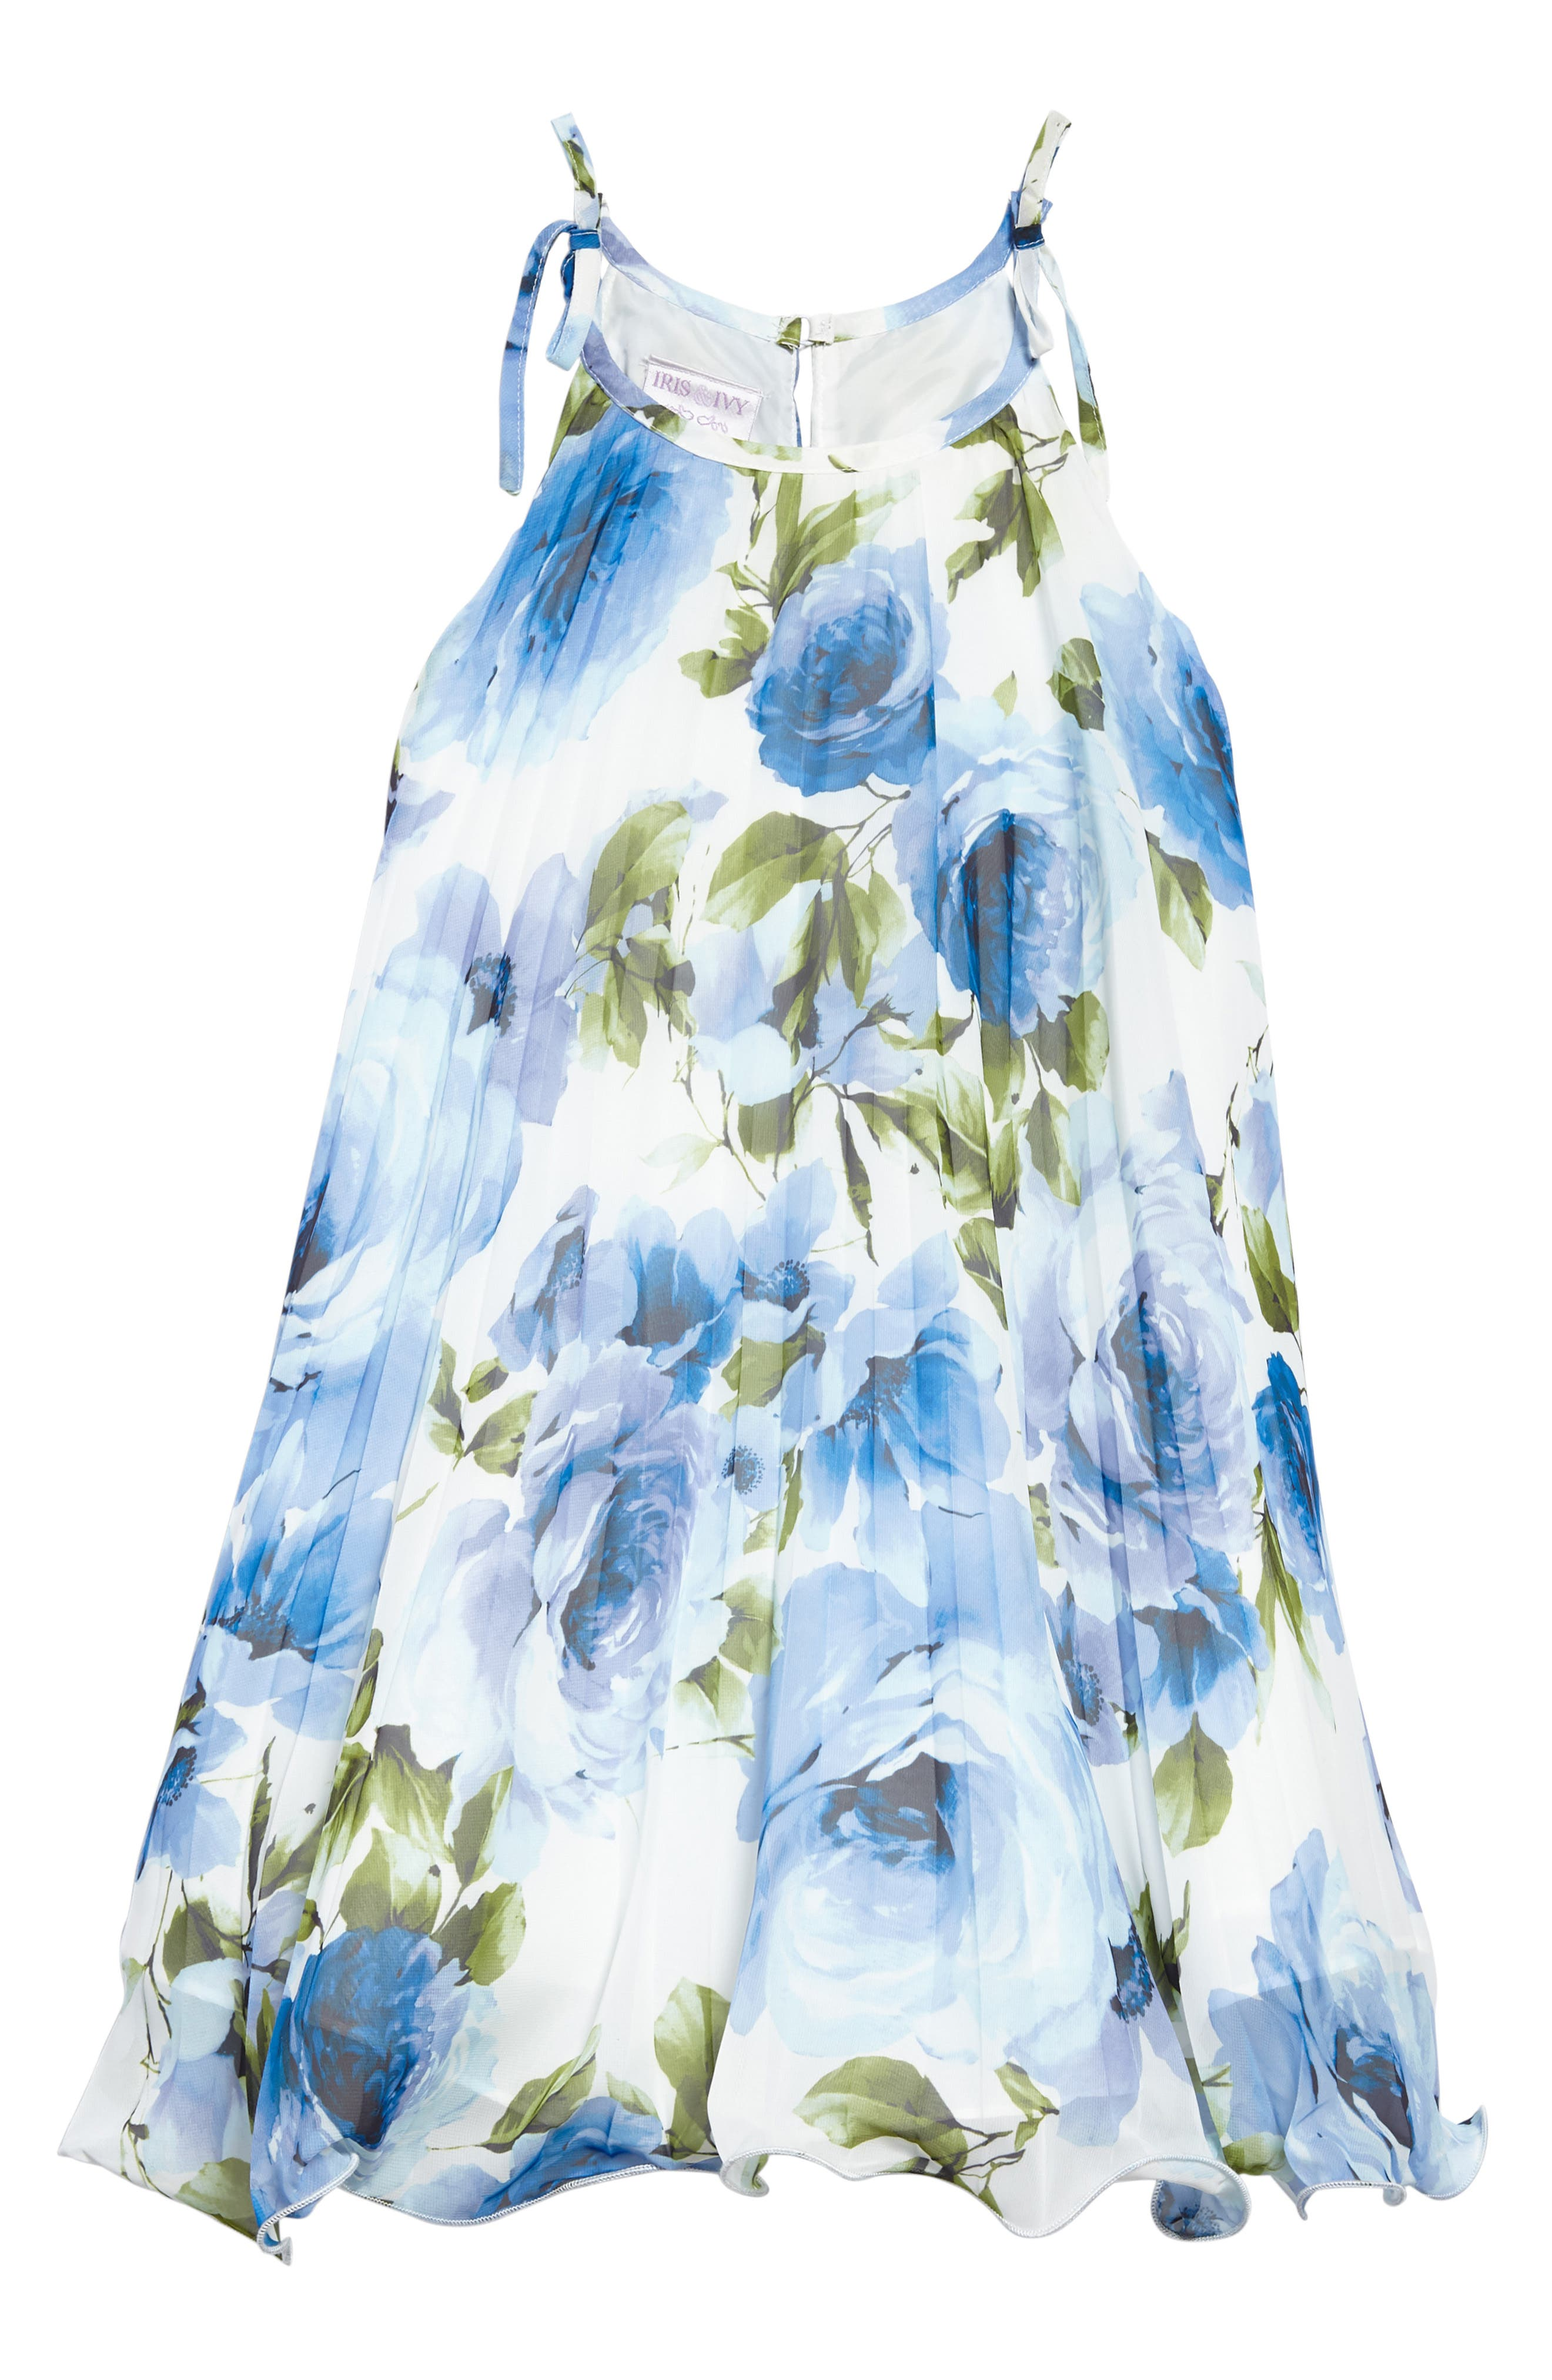 Crystal Pleat Floral Dress,                             Main thumbnail 1, color,                             Blue